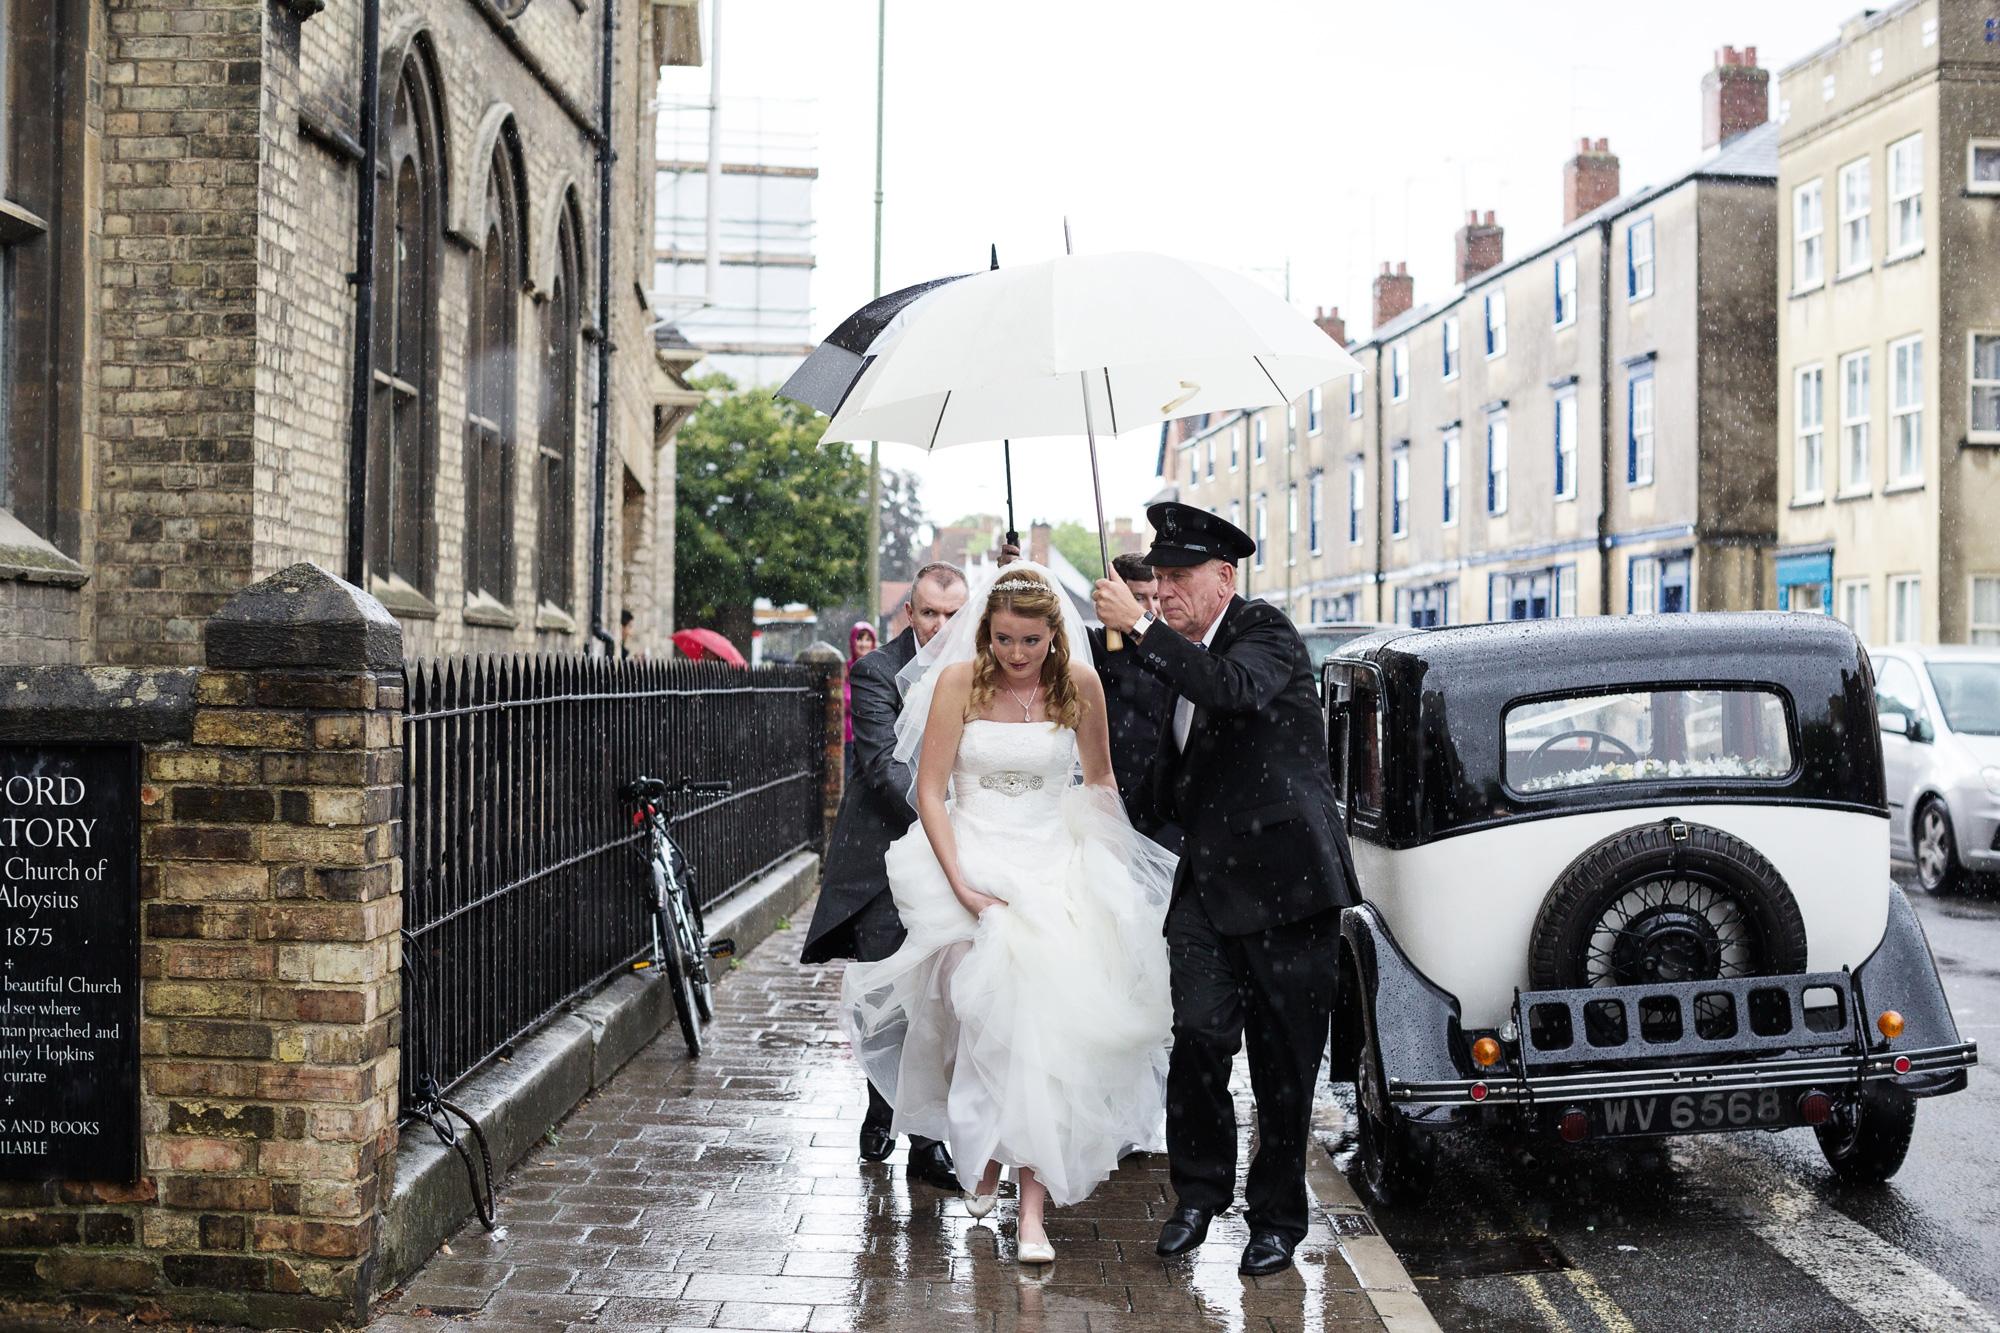 Adam_Hillier_Wedding_Photographer_Newbury_Berkshire_2 (2).jpg